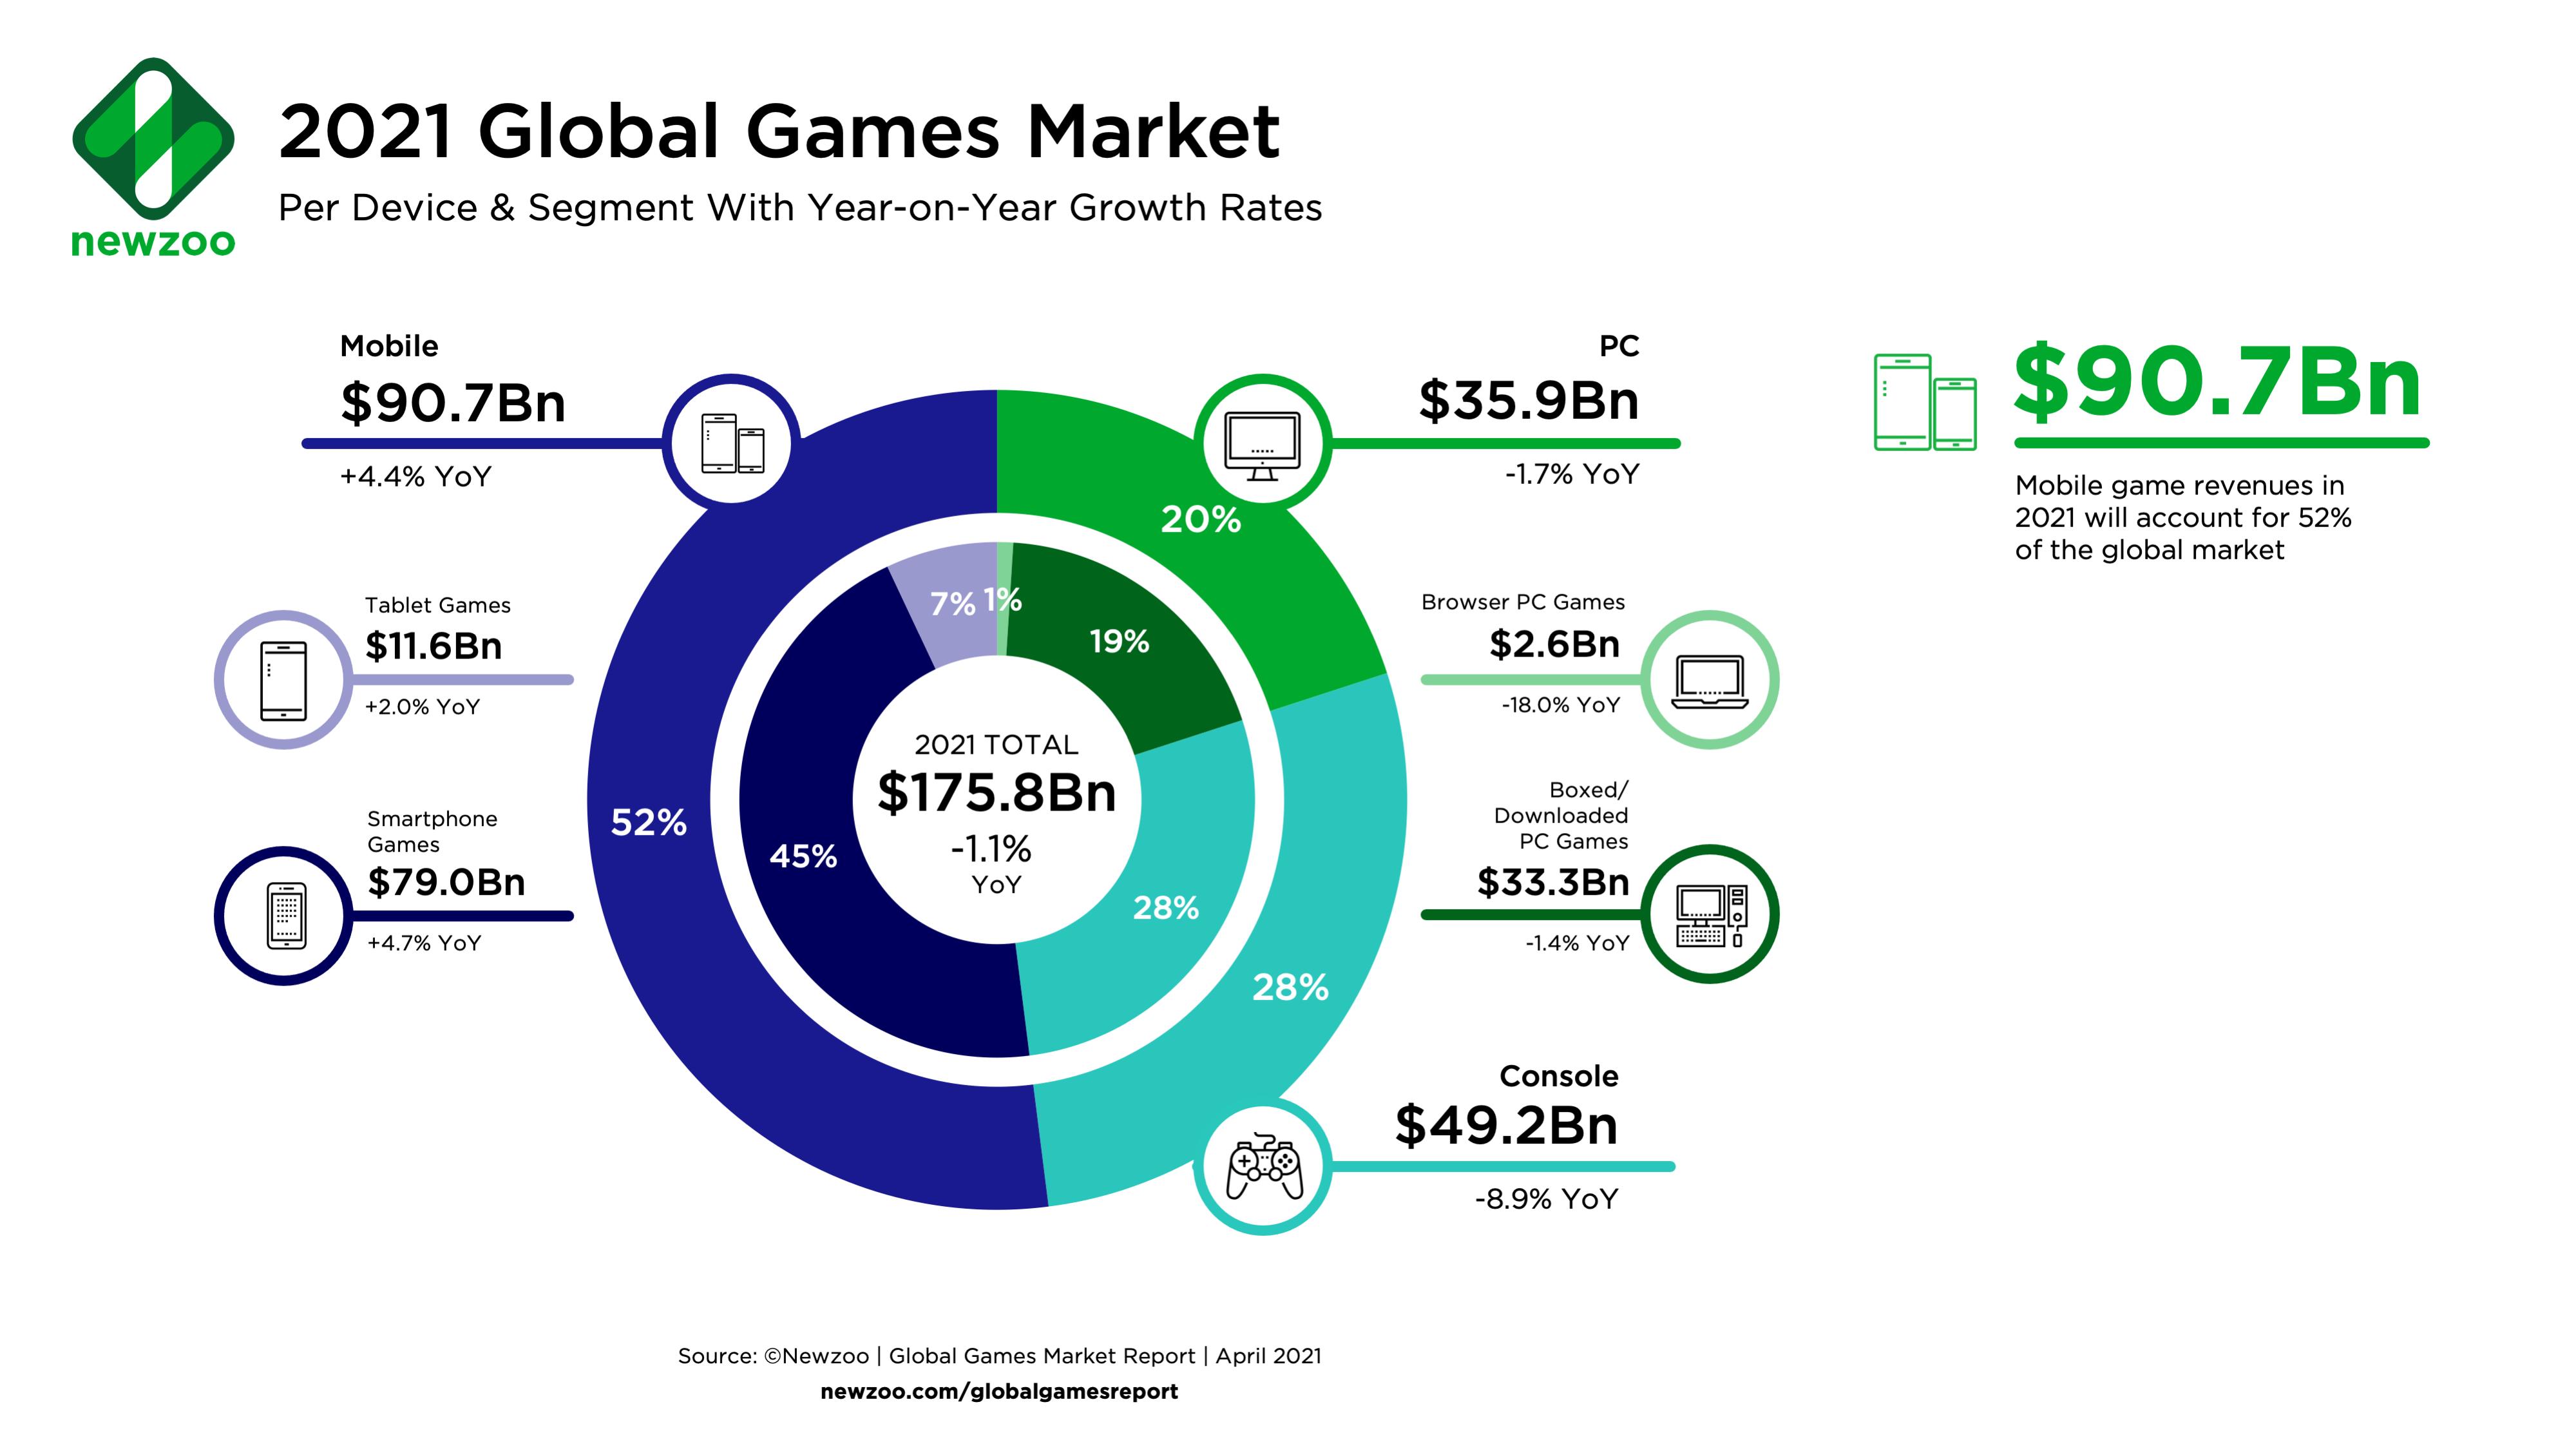 Newzoo global games market 2021 infographic